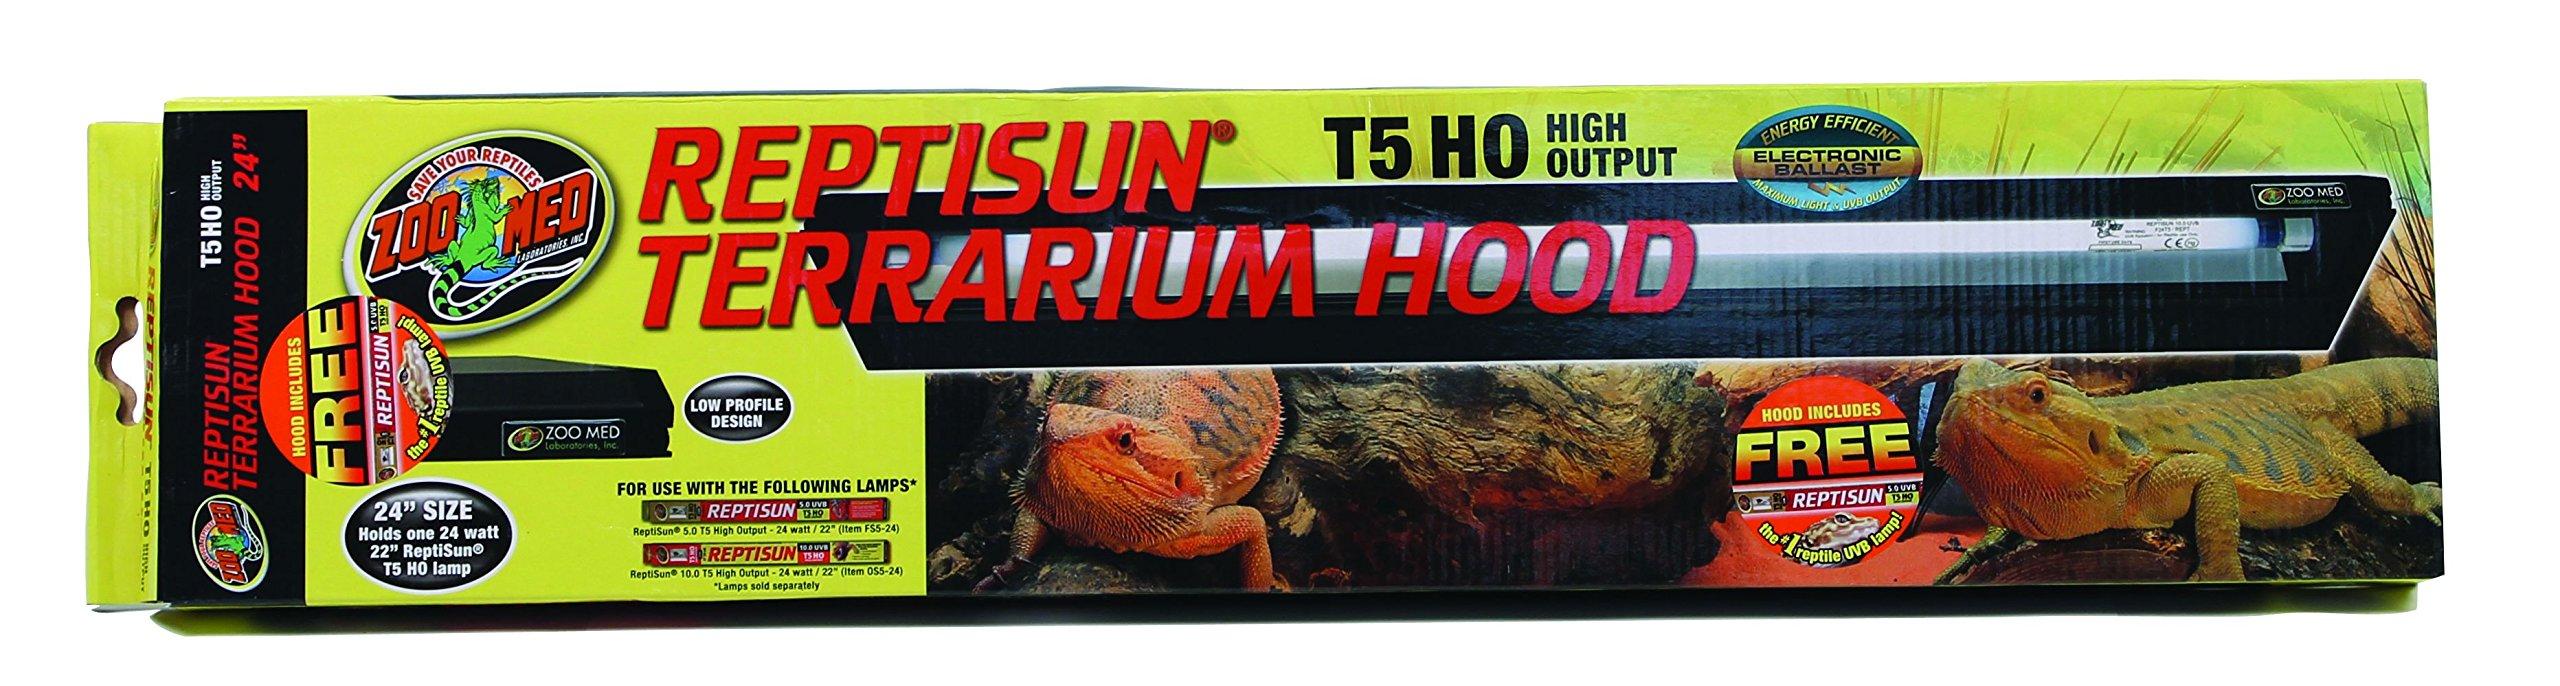 Zoo Med 26053 Reptisun T5-Ho Terrarium Hood, 24″